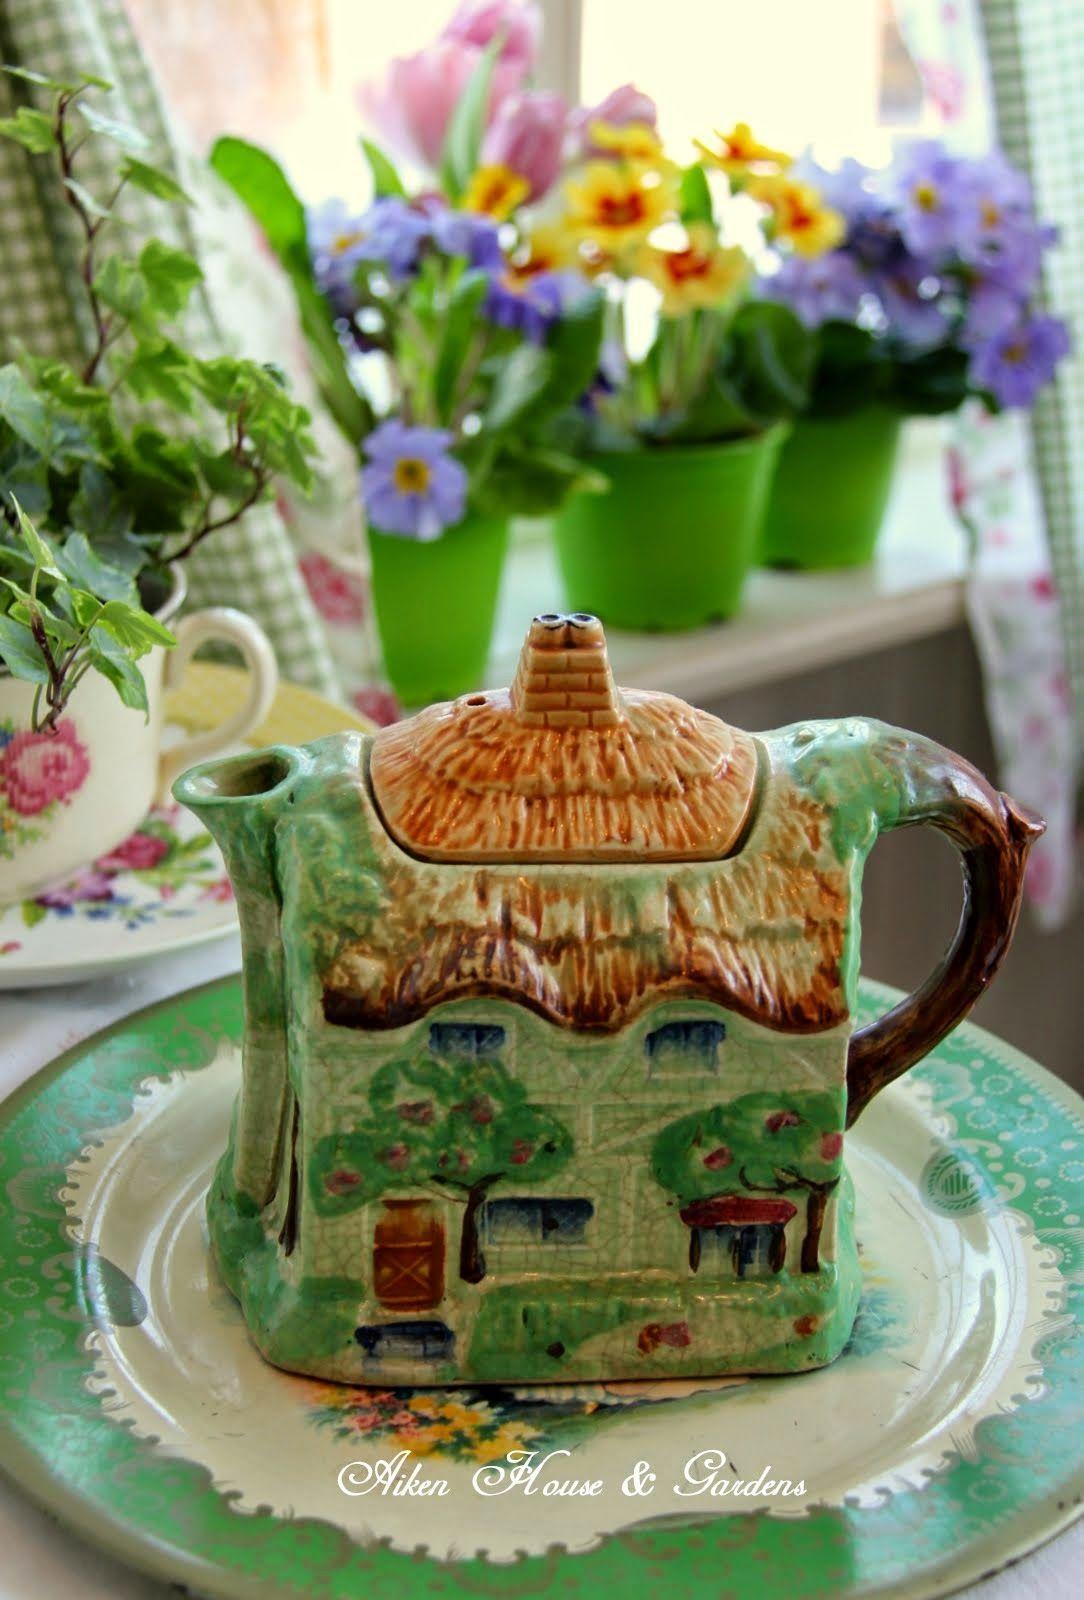 Spring Green Tea pots, Tea, Novelty teapots